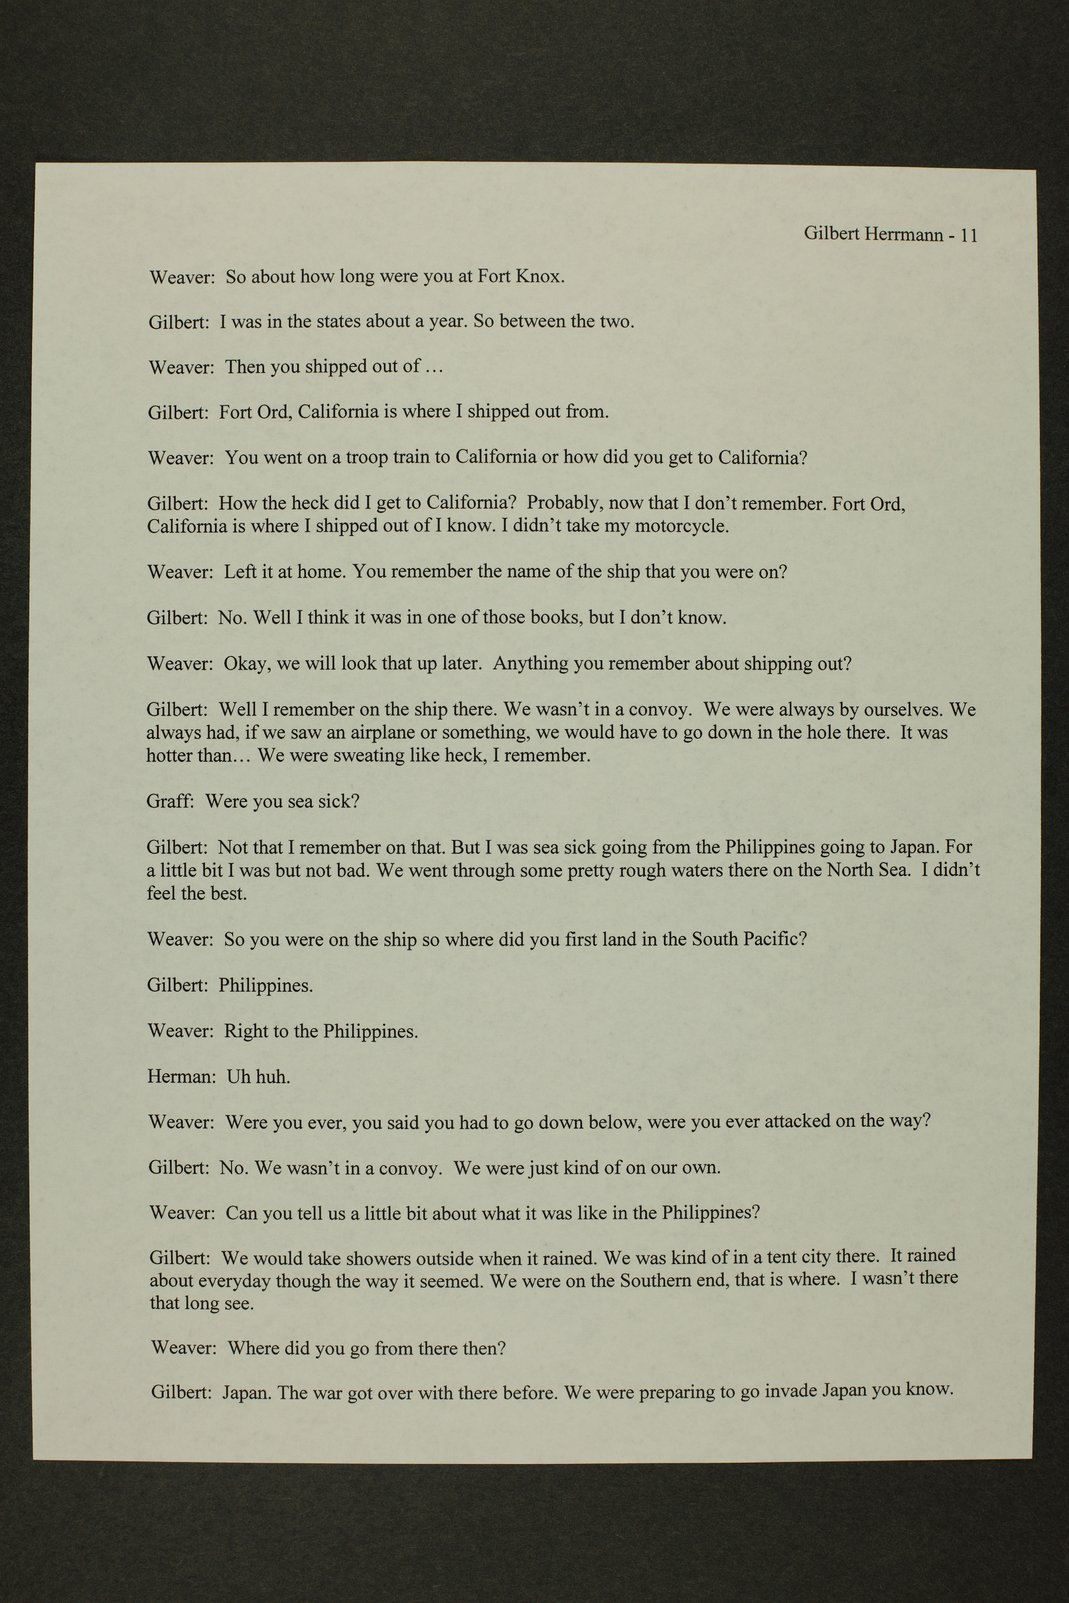 Gilbert Herrman interview, WWII oral history, Kinsley, Kansas - 11